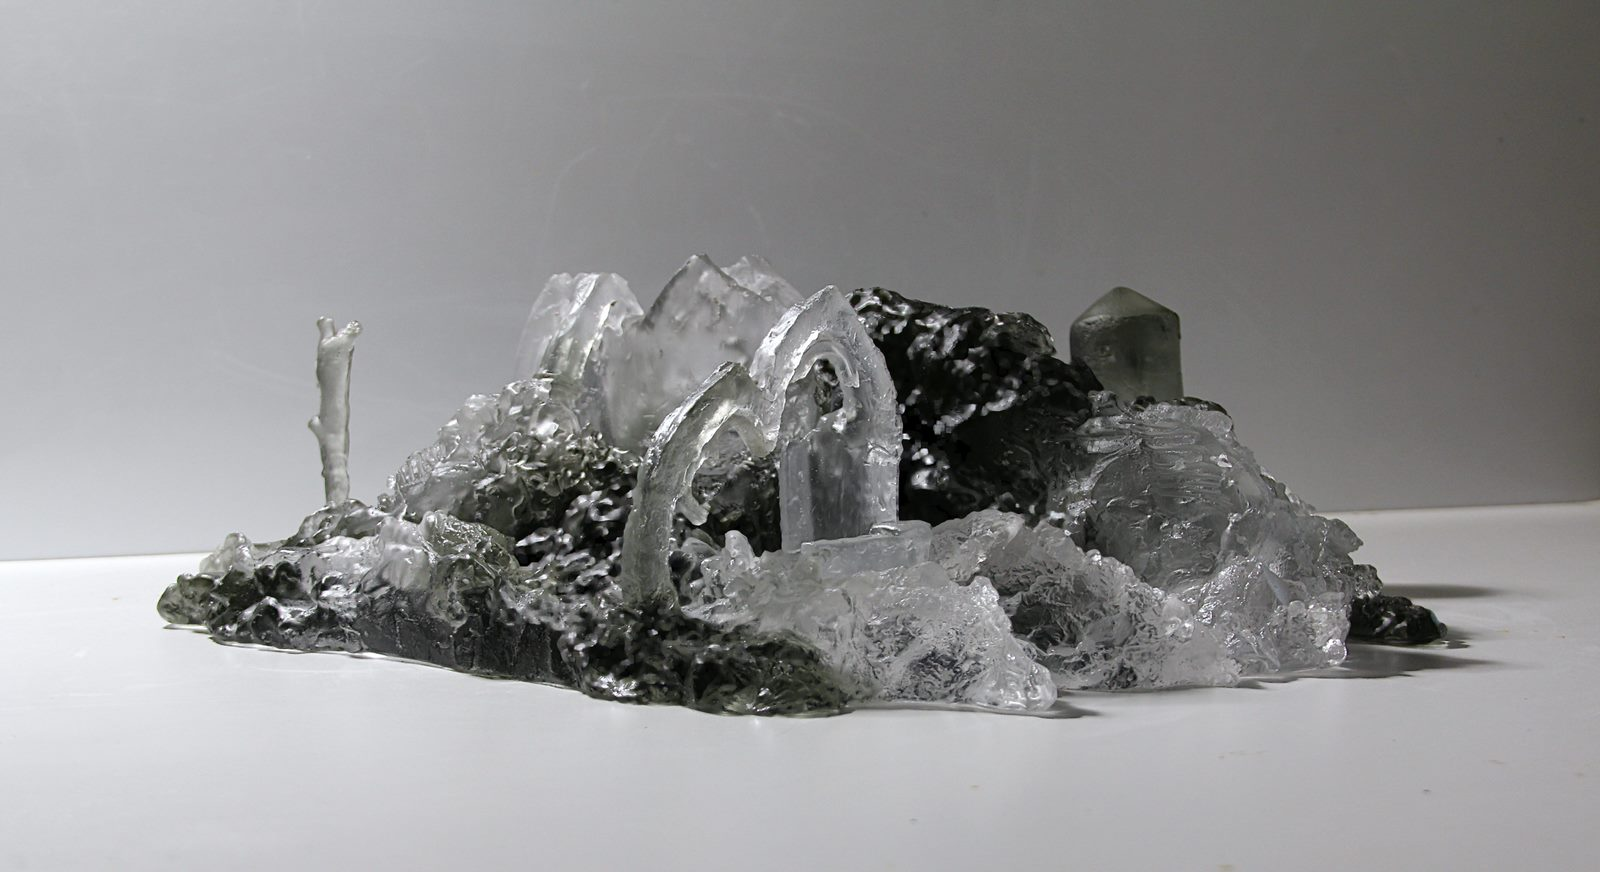 Grande ruine moderne, pâte de verre, verre gris et incolore, 2019